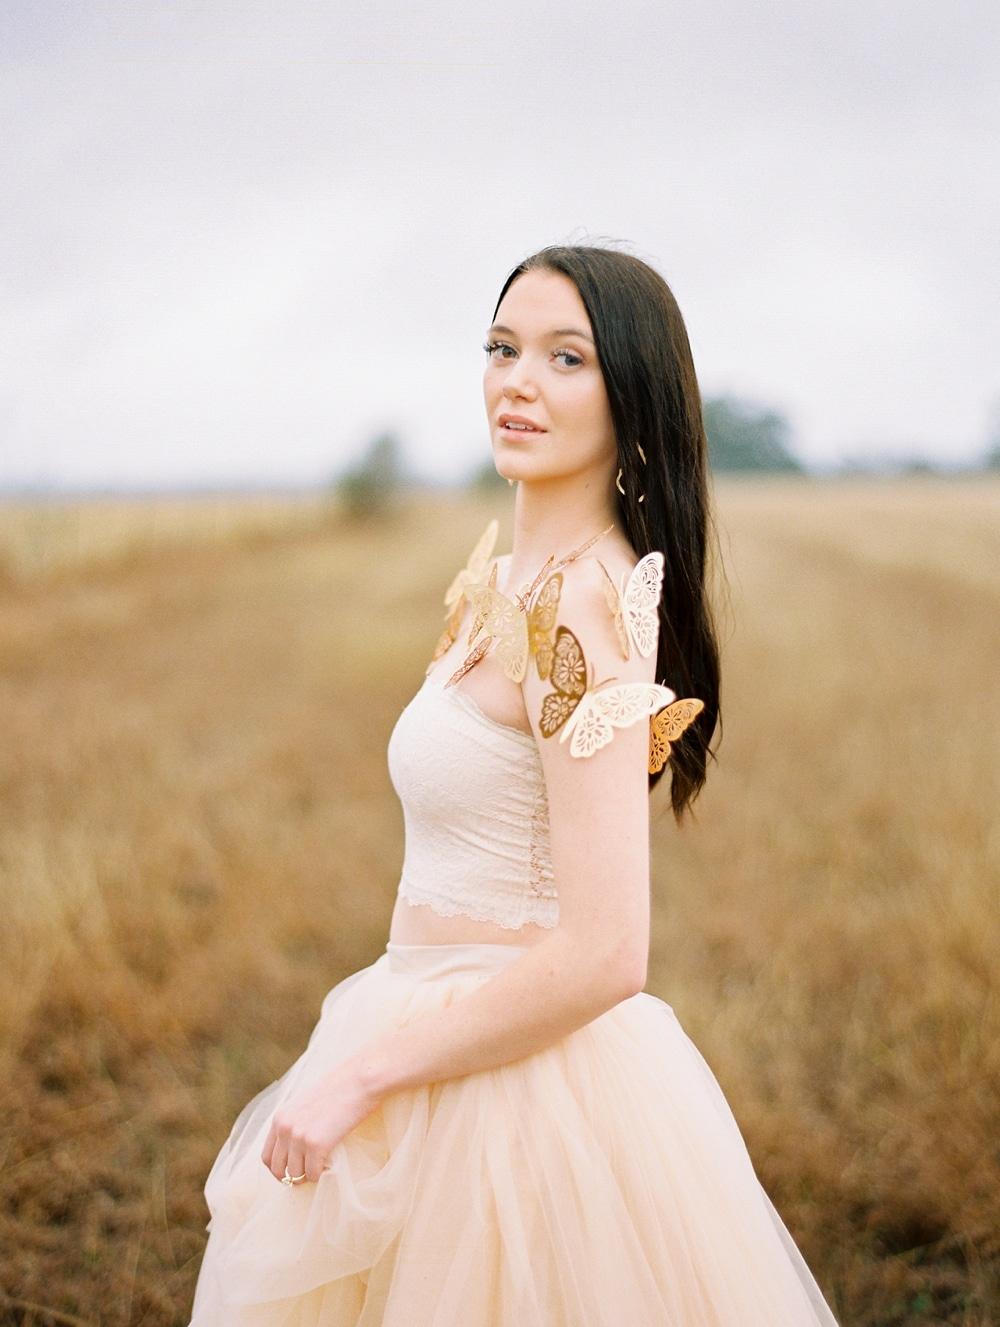 Kristin-La-Voie-Photography-fine-art-wedding-bridal-boudoir-texas-photographer-Dallas-Austin-San-Marcos-wahwahtaysee-resort-34